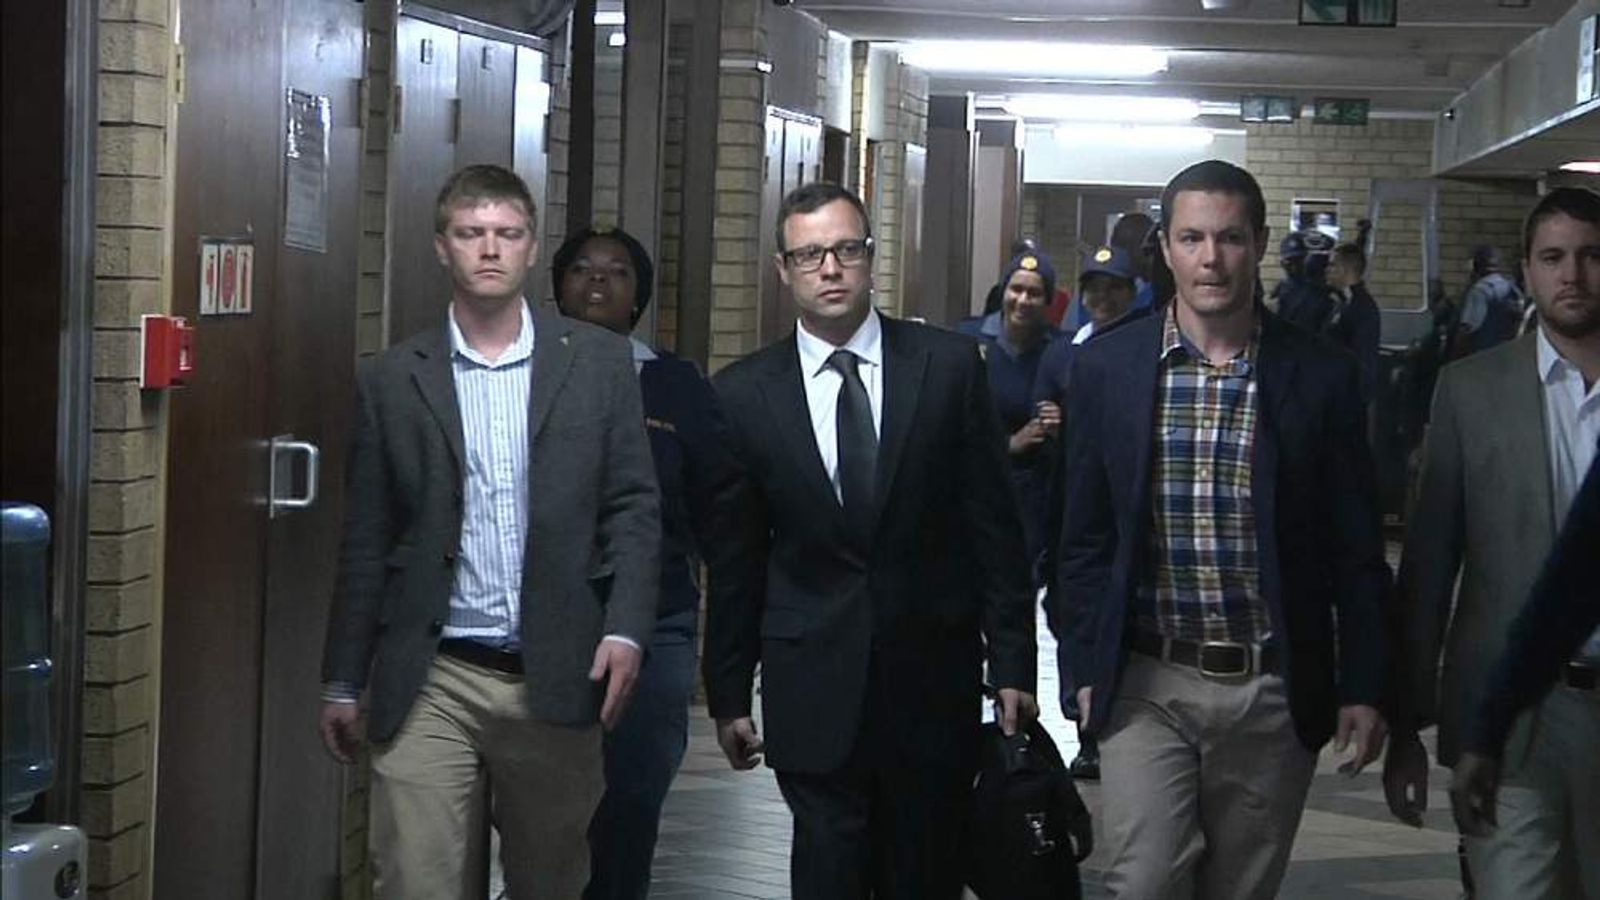 Oscar Pistorius arrives in court